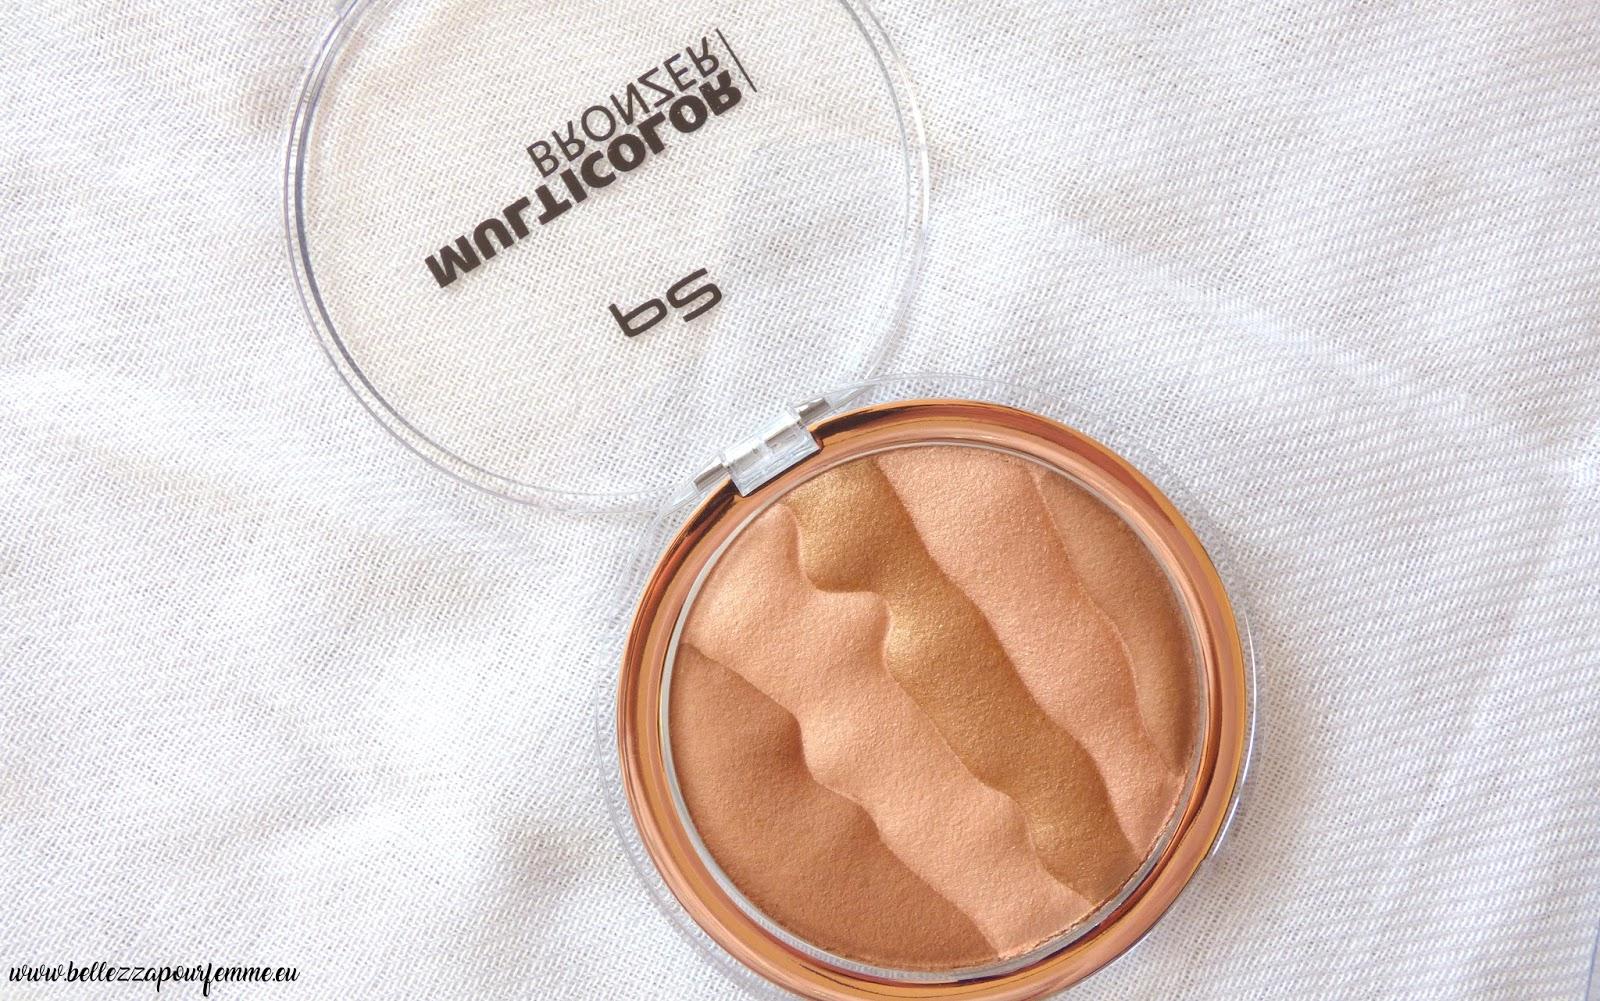 p2 Cosmetics - multicolor bronzer